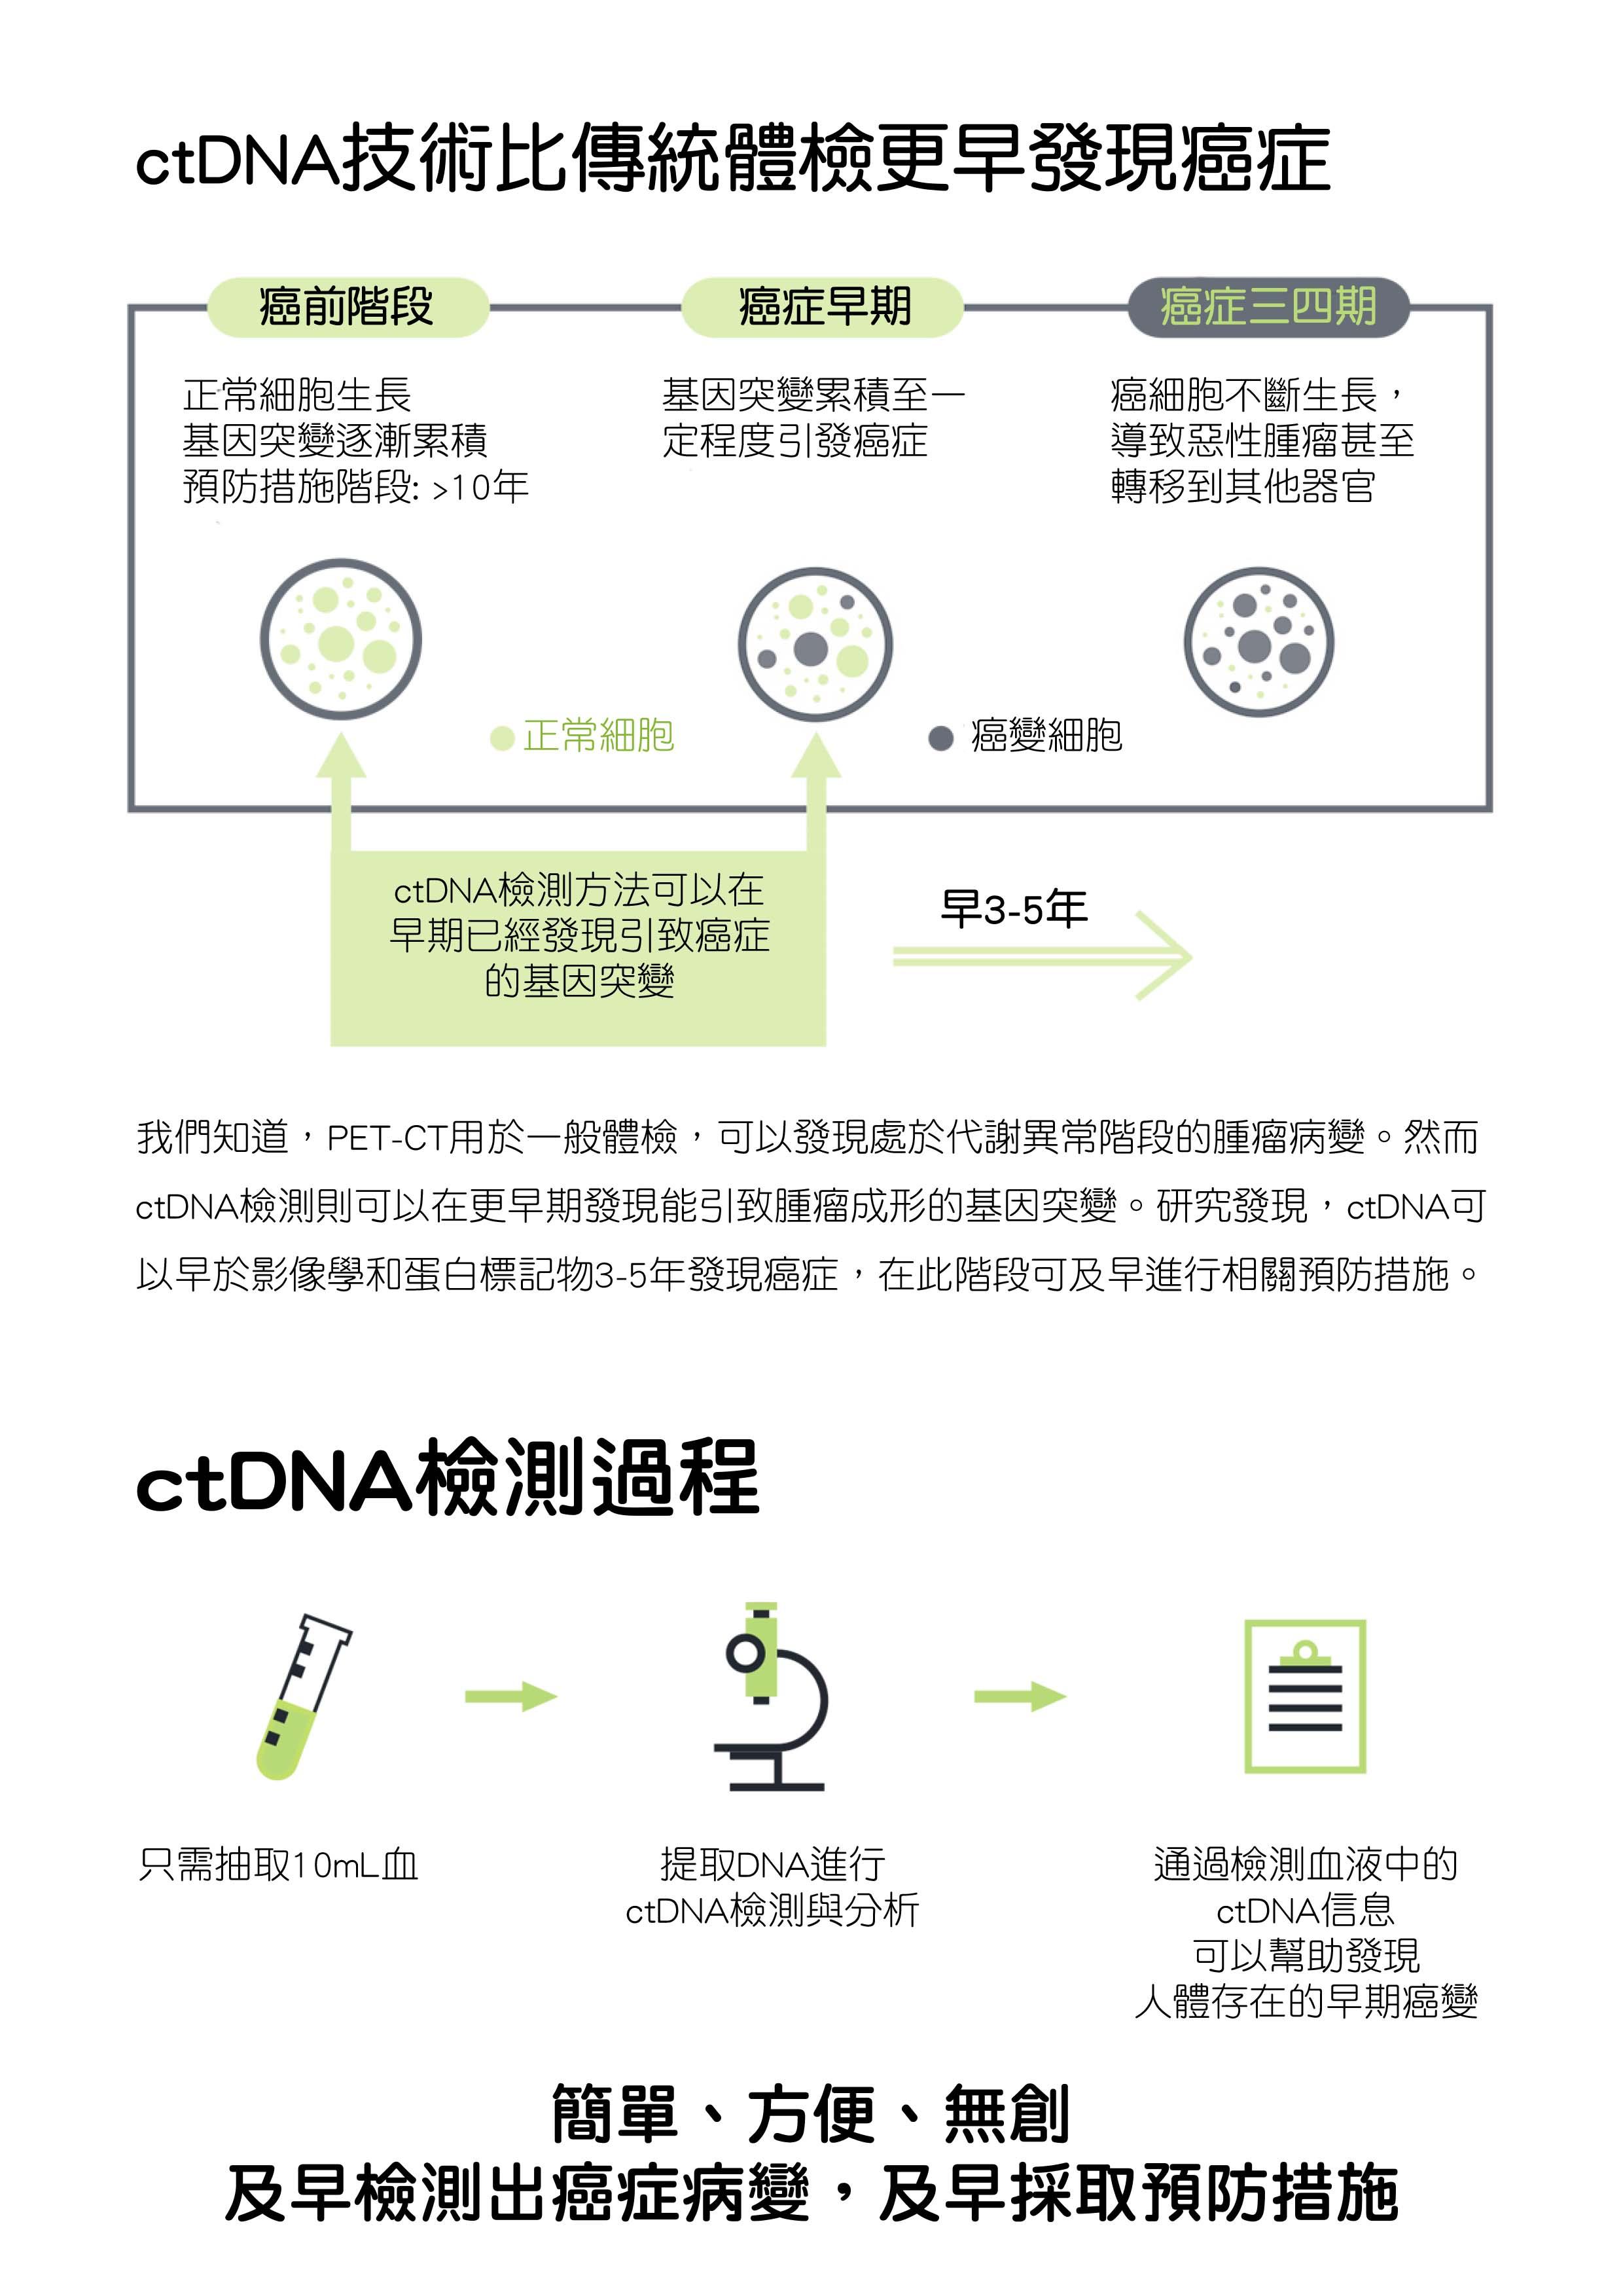 ctdna-ctdna-early-cancer-sreening-3.jpg